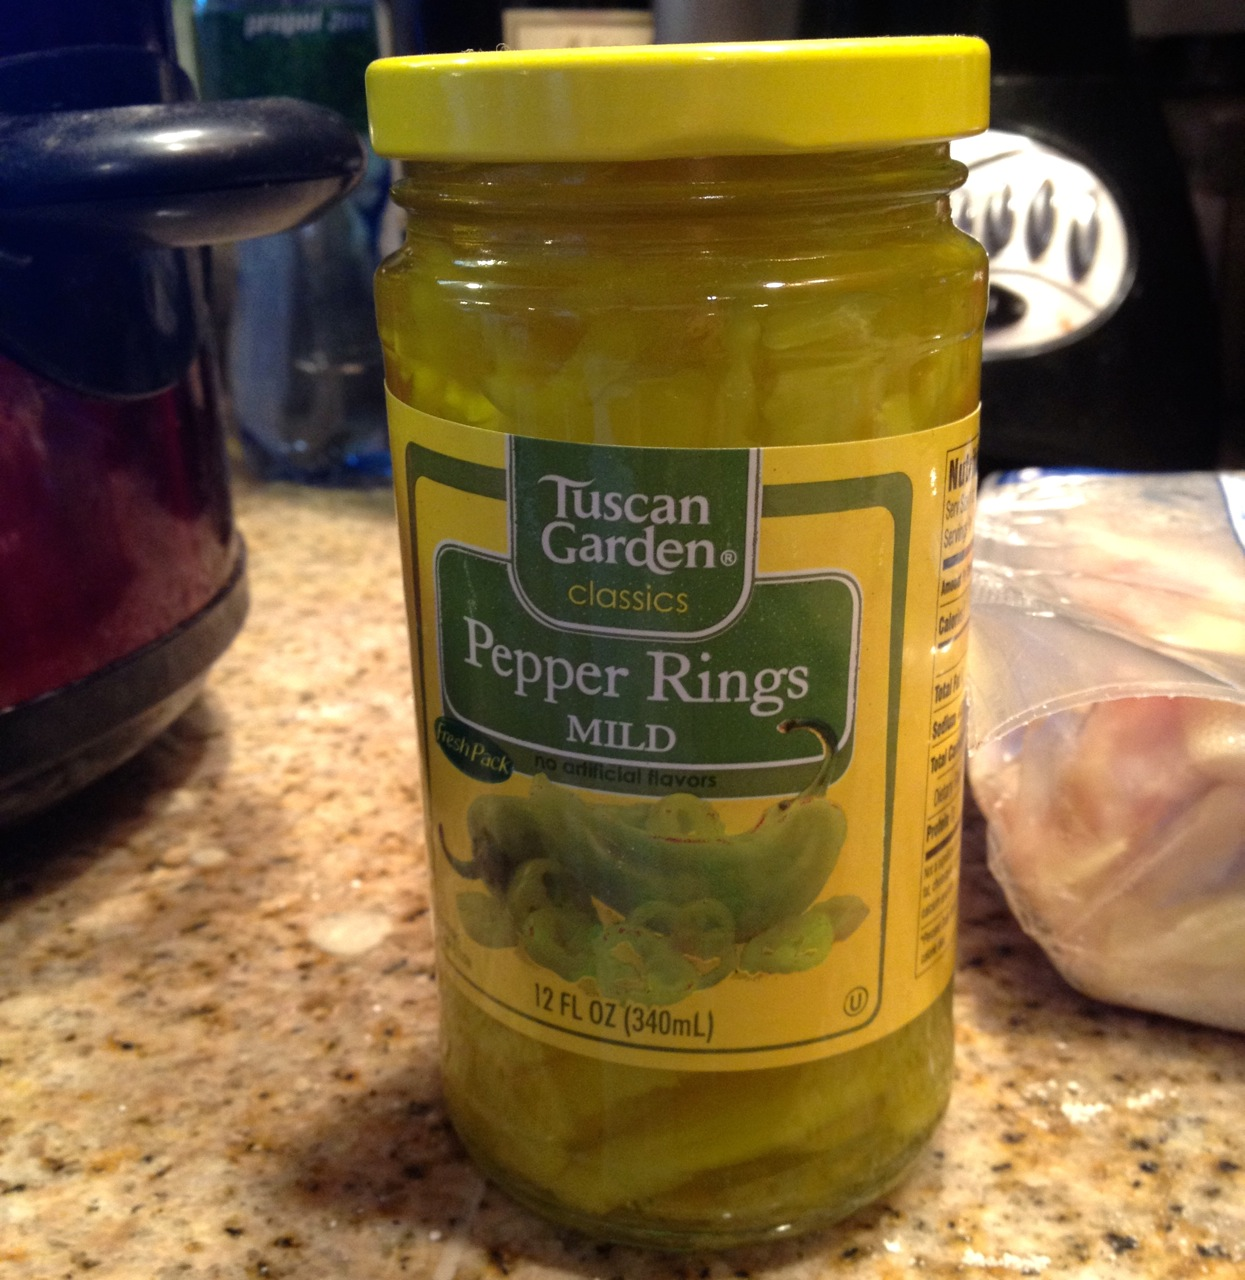 Jar of Pepper Rings